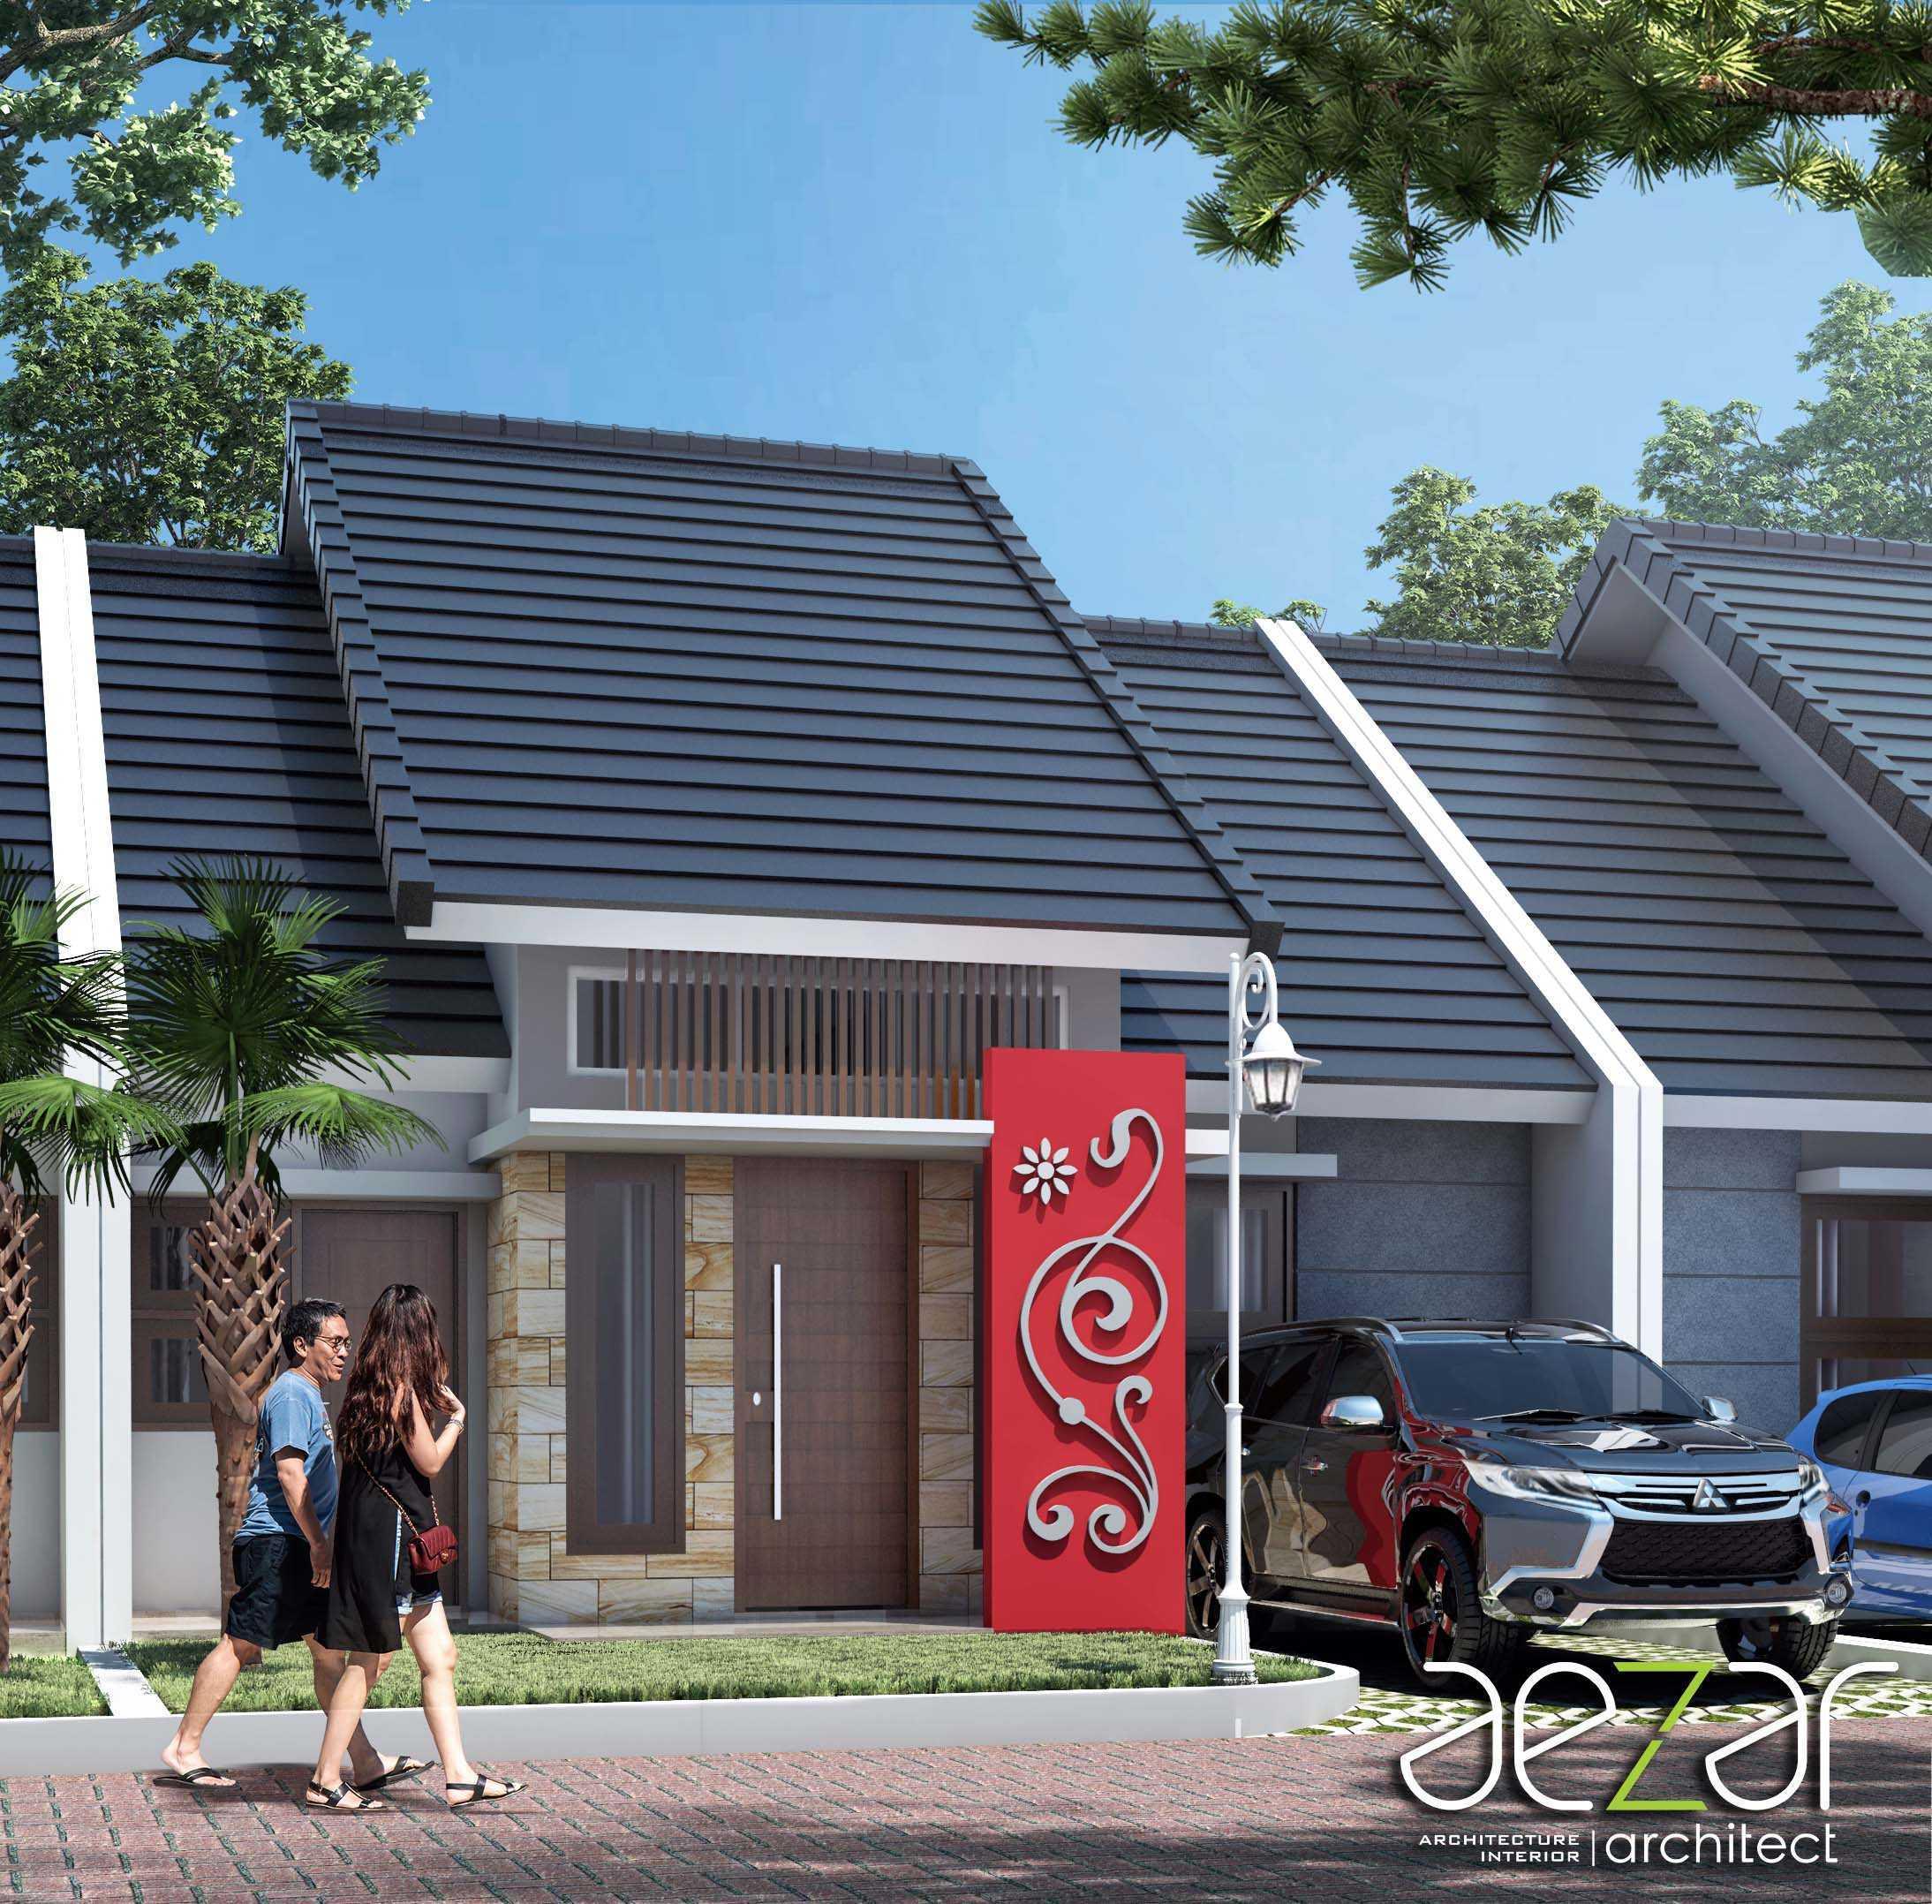 Aezar Architect Perumahan Villa Exist Sempurna Kabupaten Batang, Jawa Tengah, Indonesia Kabupaten Batang, Jawa Tengah, Indonesia Exterior View Minimalis 54487